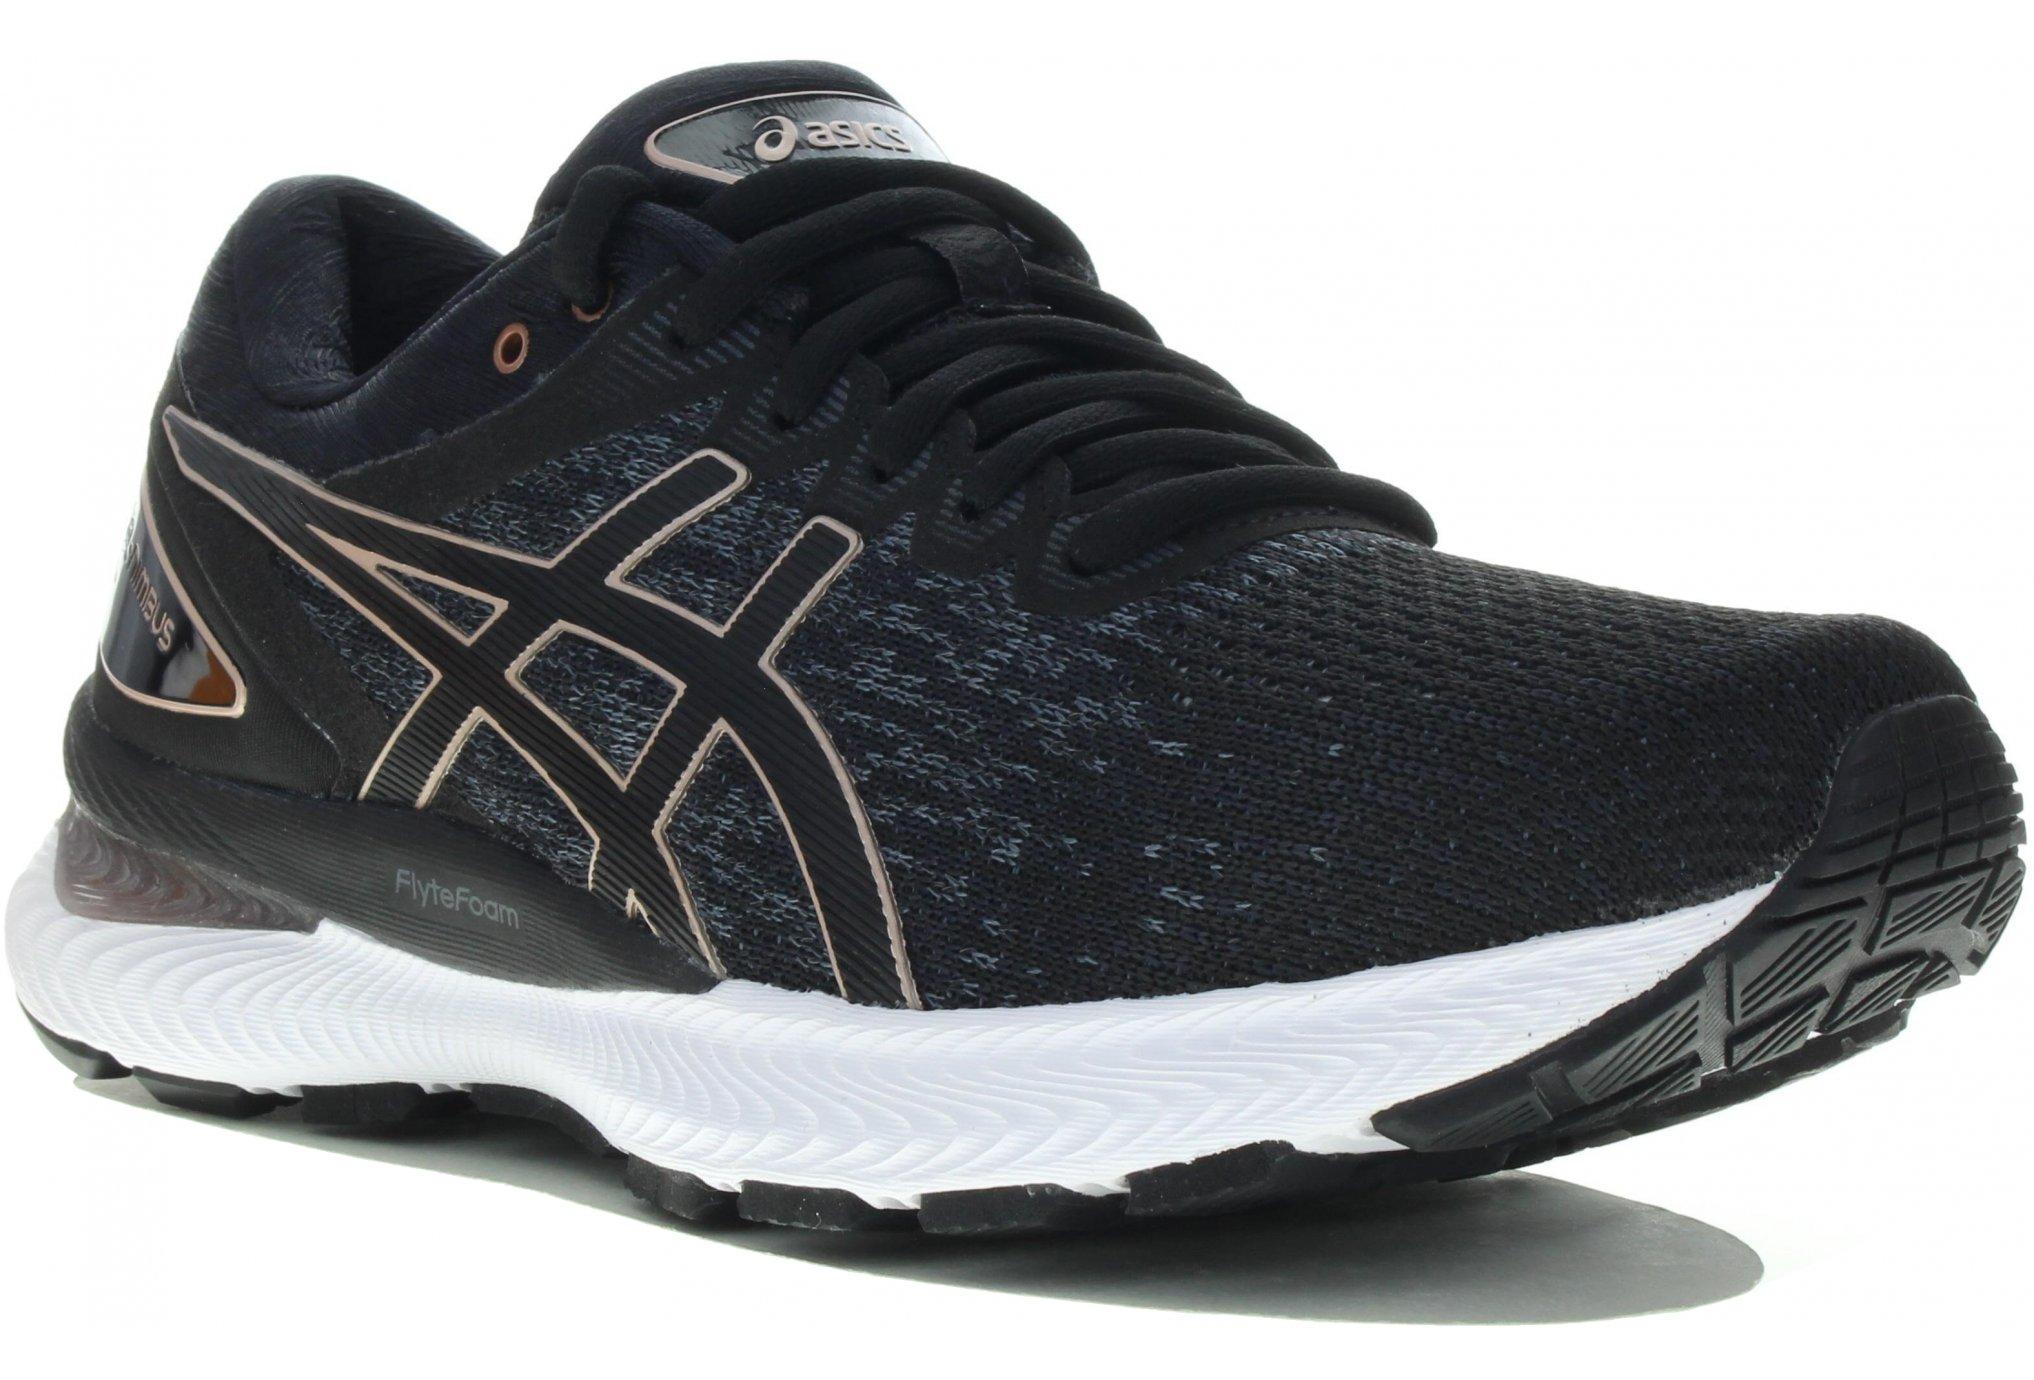 Asics Gel-Nimbus 22 Knit Chaussures running femme